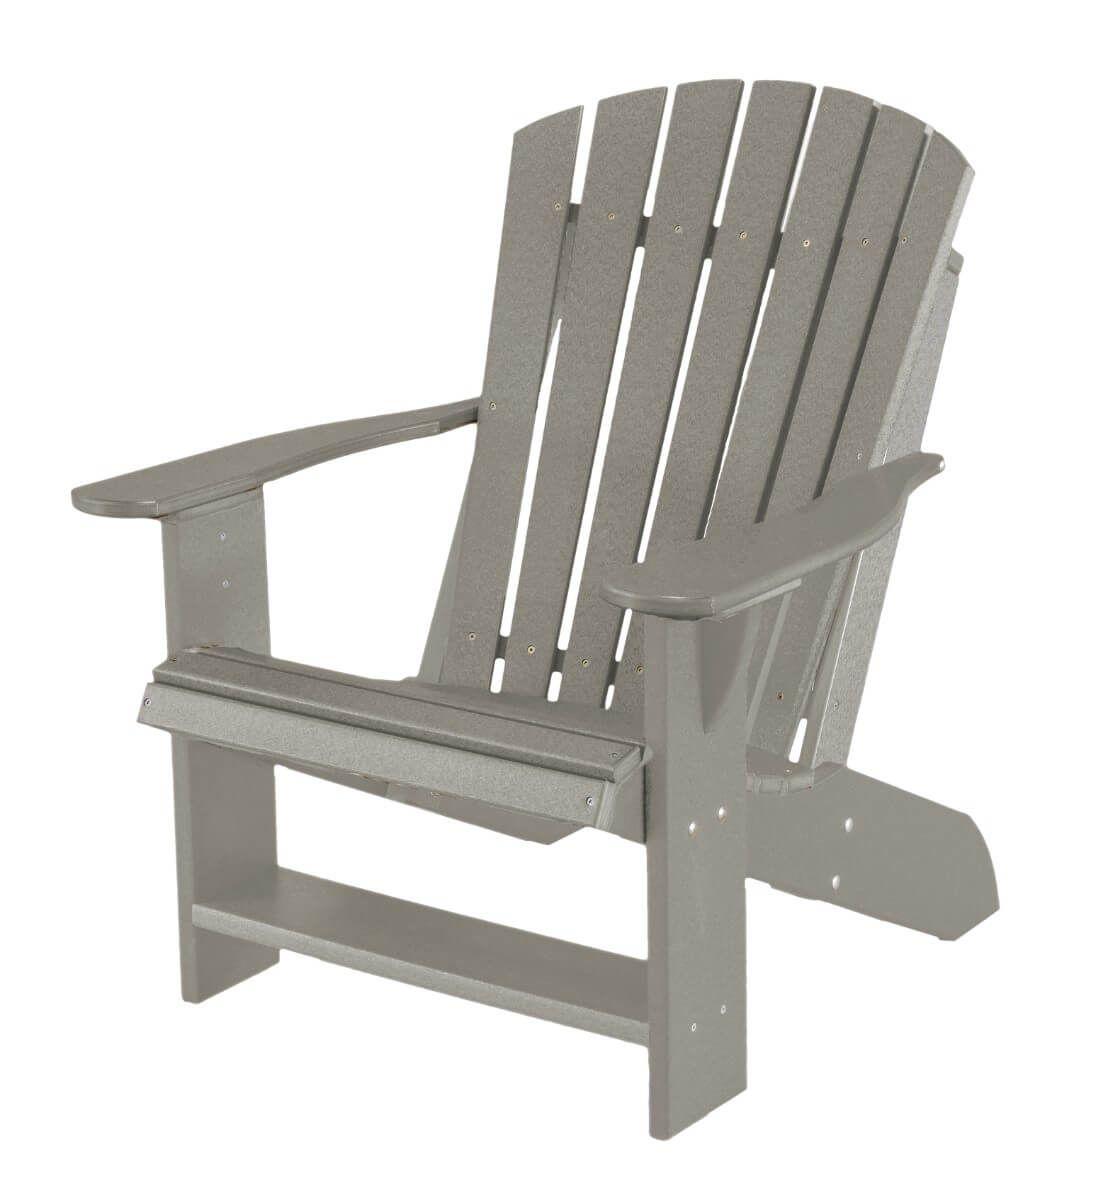 Light Gray Sidra Adirondack Chair